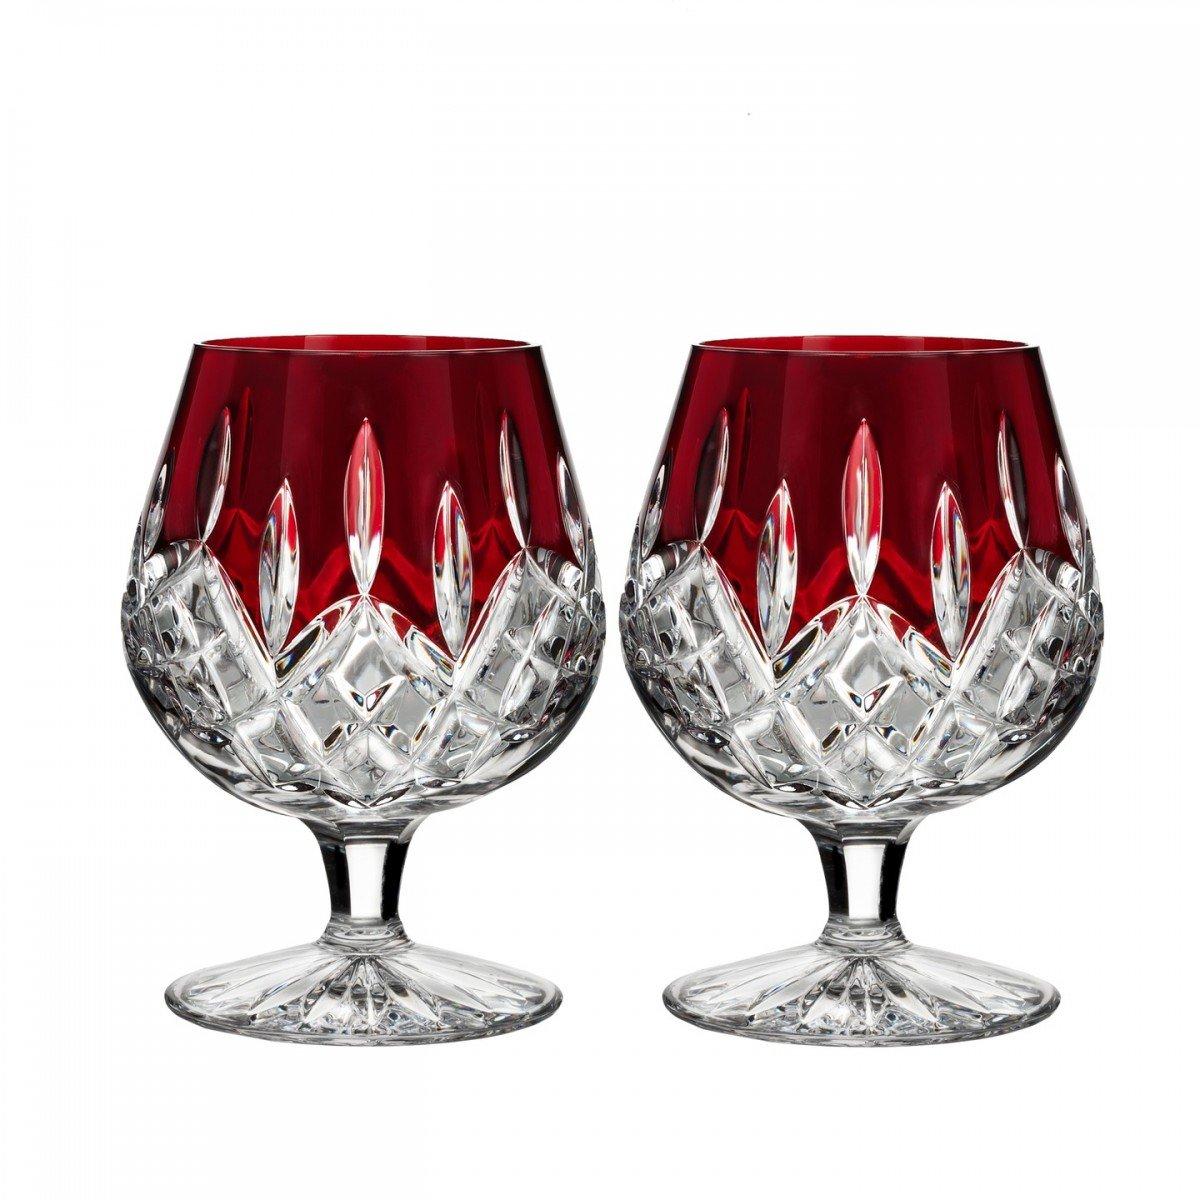 Waterford Lismore Red Brandy, Pair by Waterford